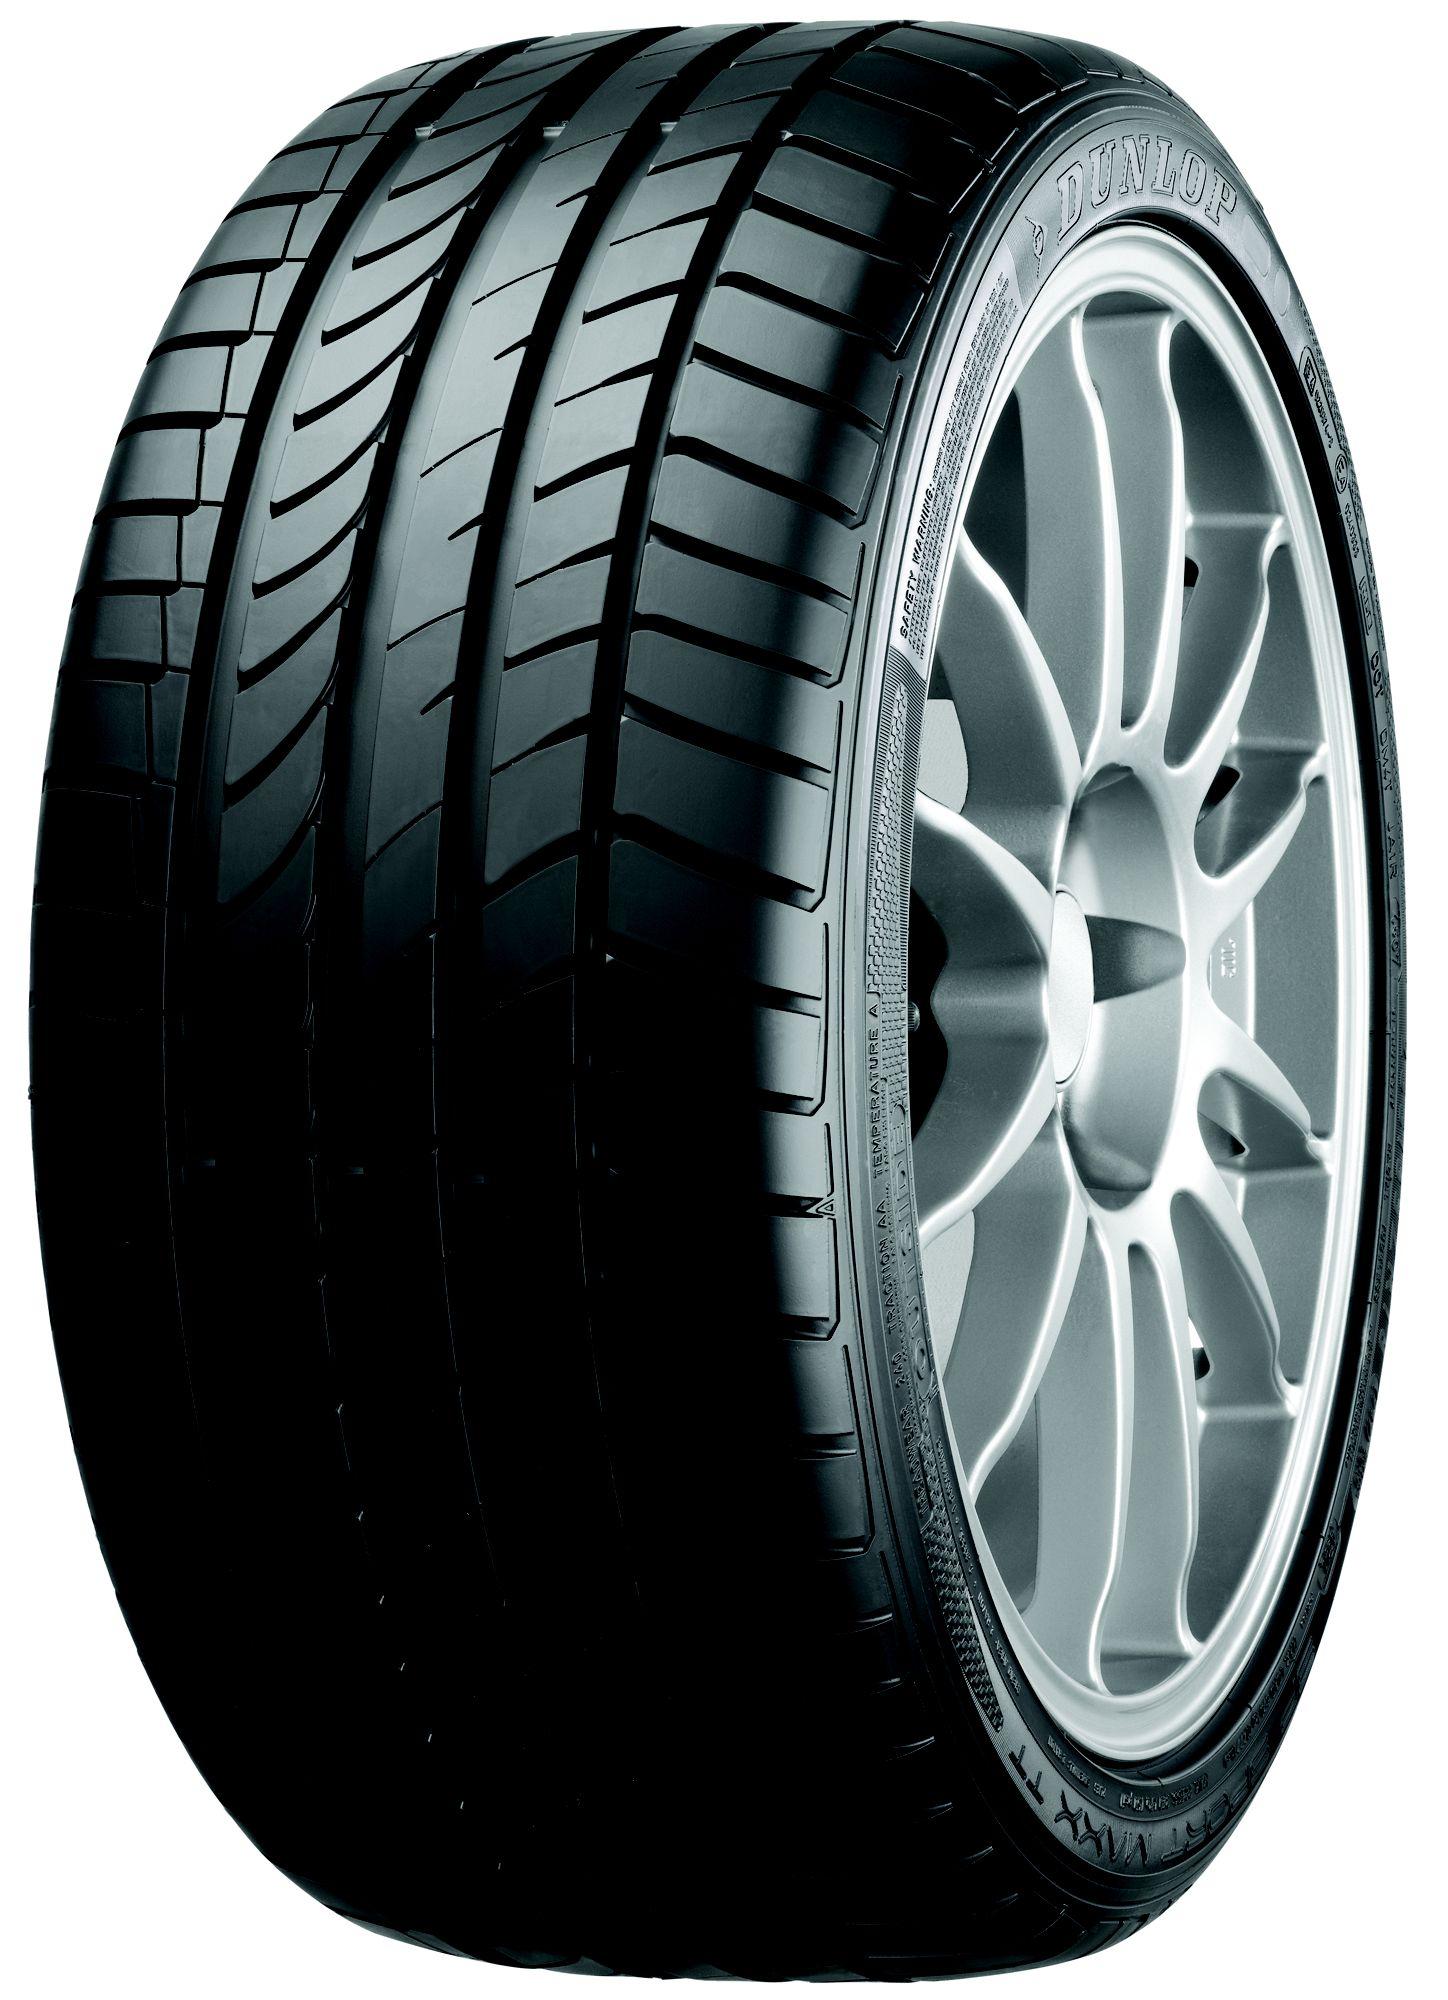 dunlop sp sport maxx tt tire 245 50r18 100y bw. Black Bedroom Furniture Sets. Home Design Ideas